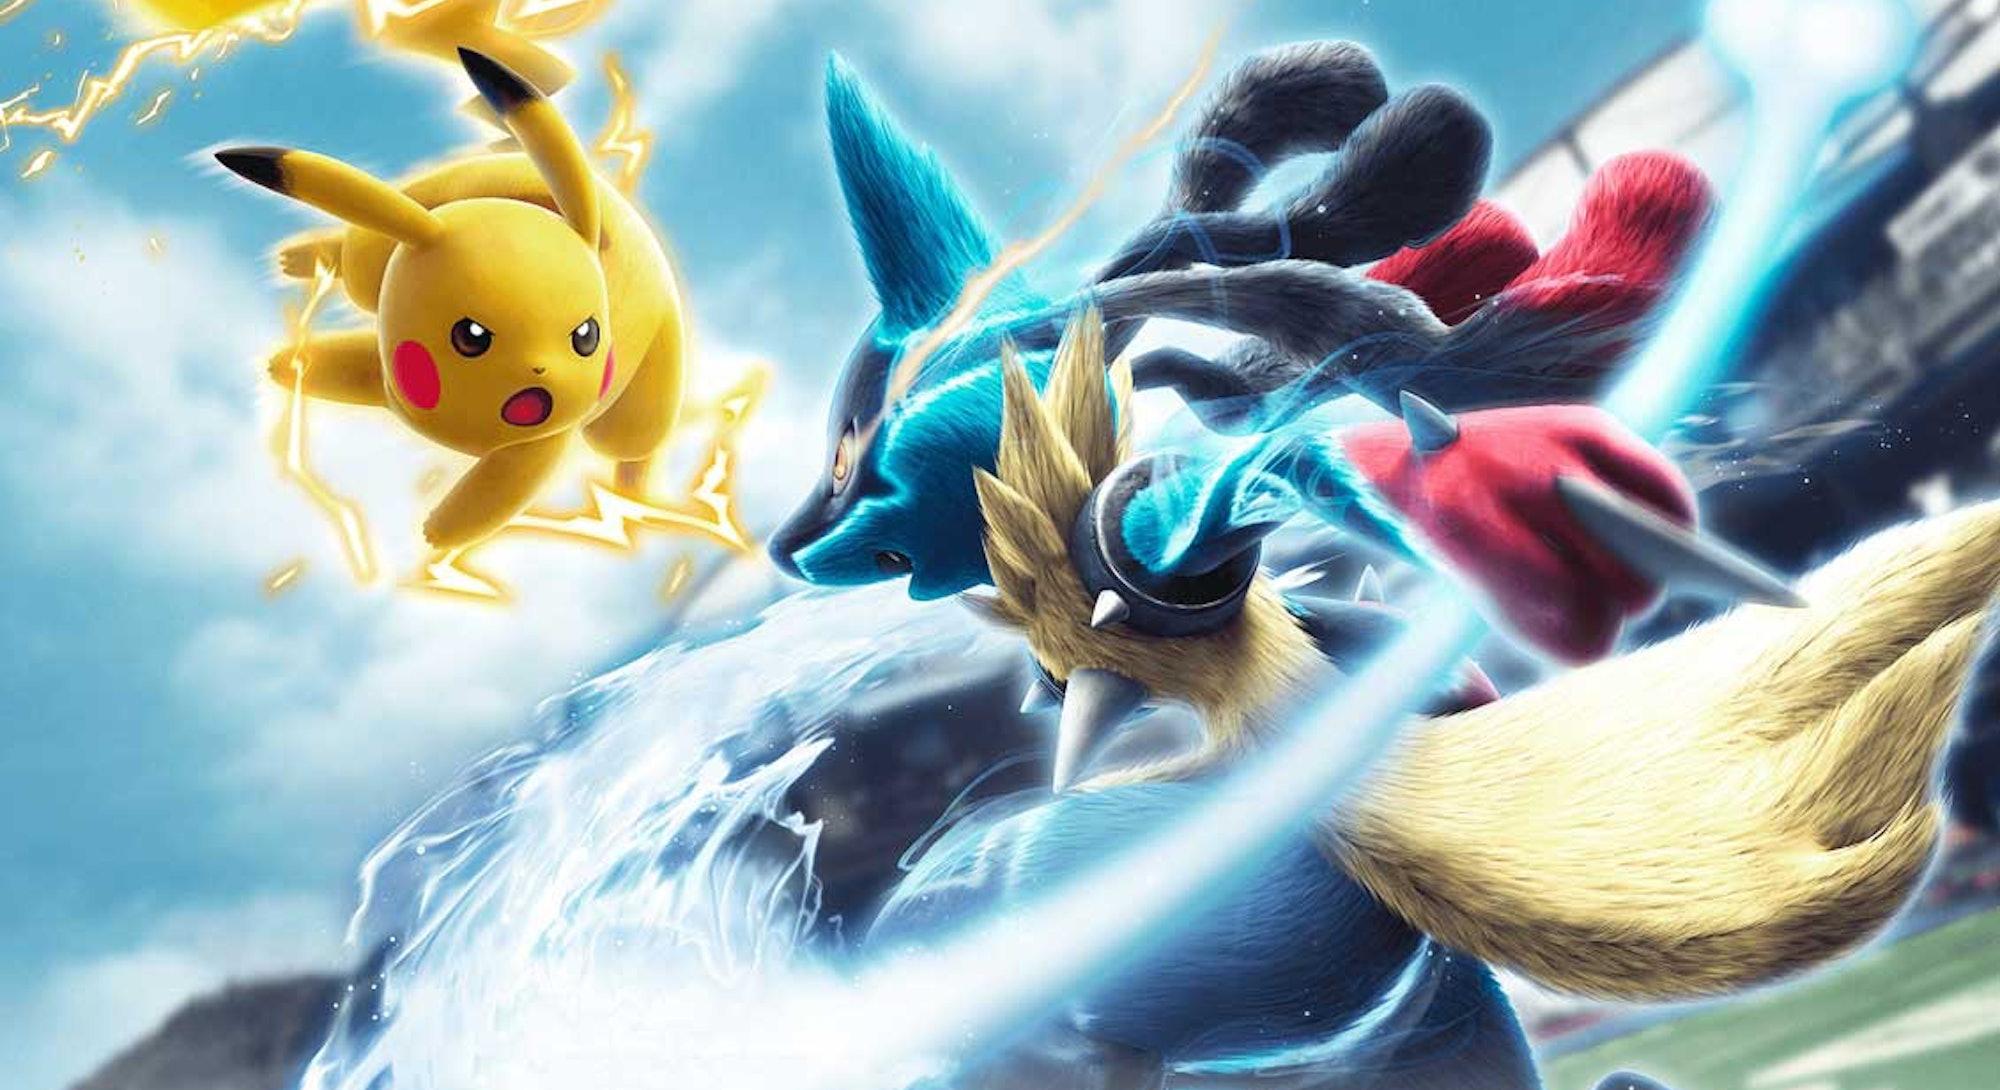 Pikachu battling Lucario in Pokken Tournament